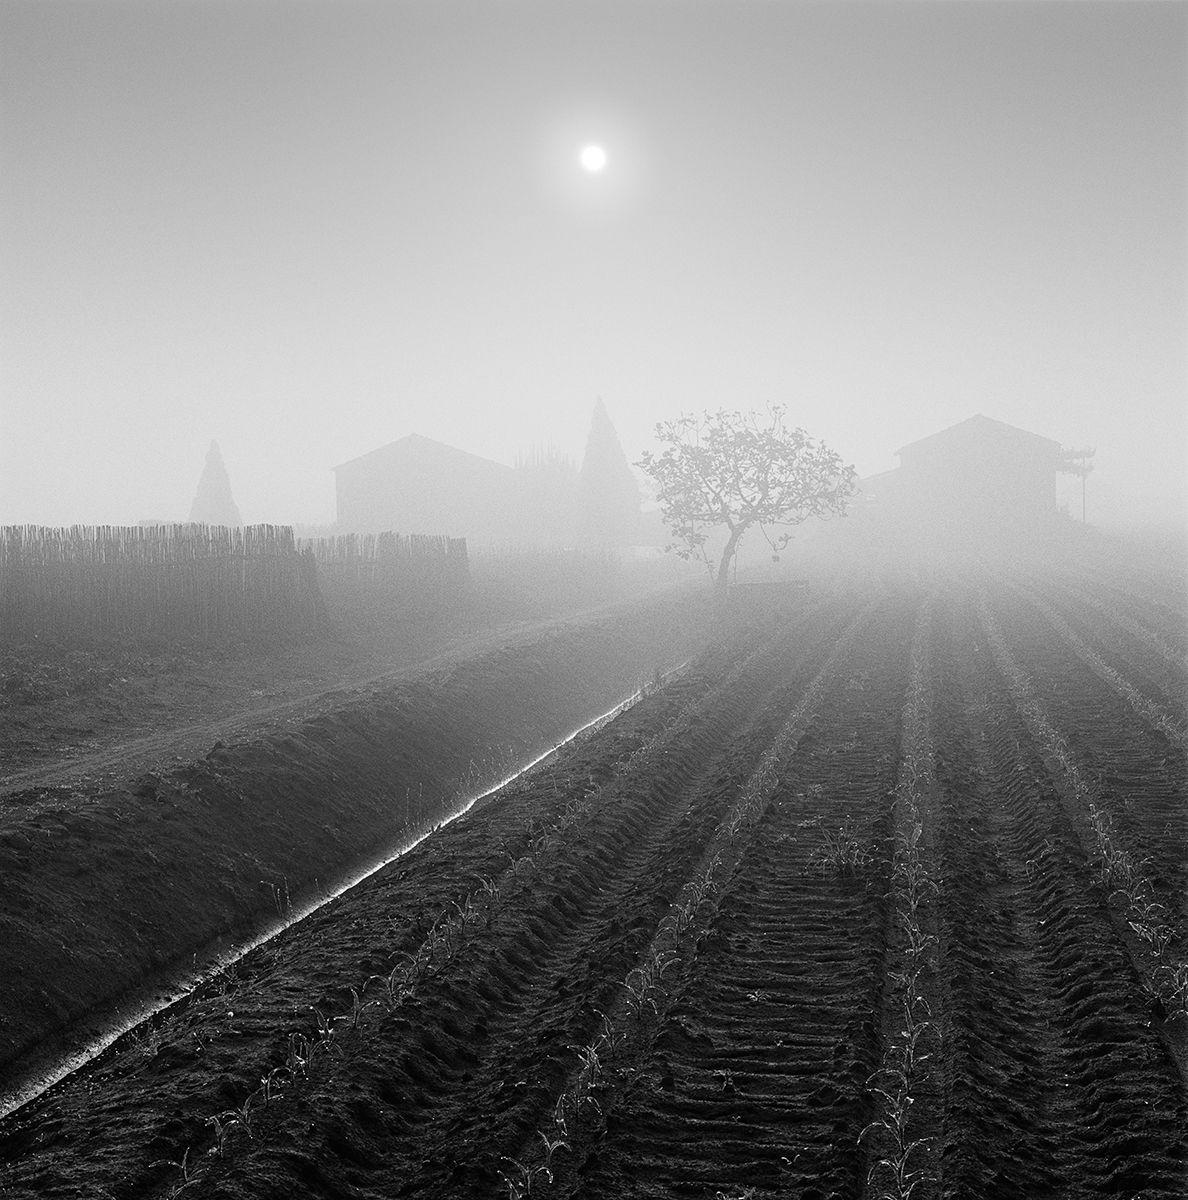 Farm and Culvert (Diffuse Glow) copy.jpg